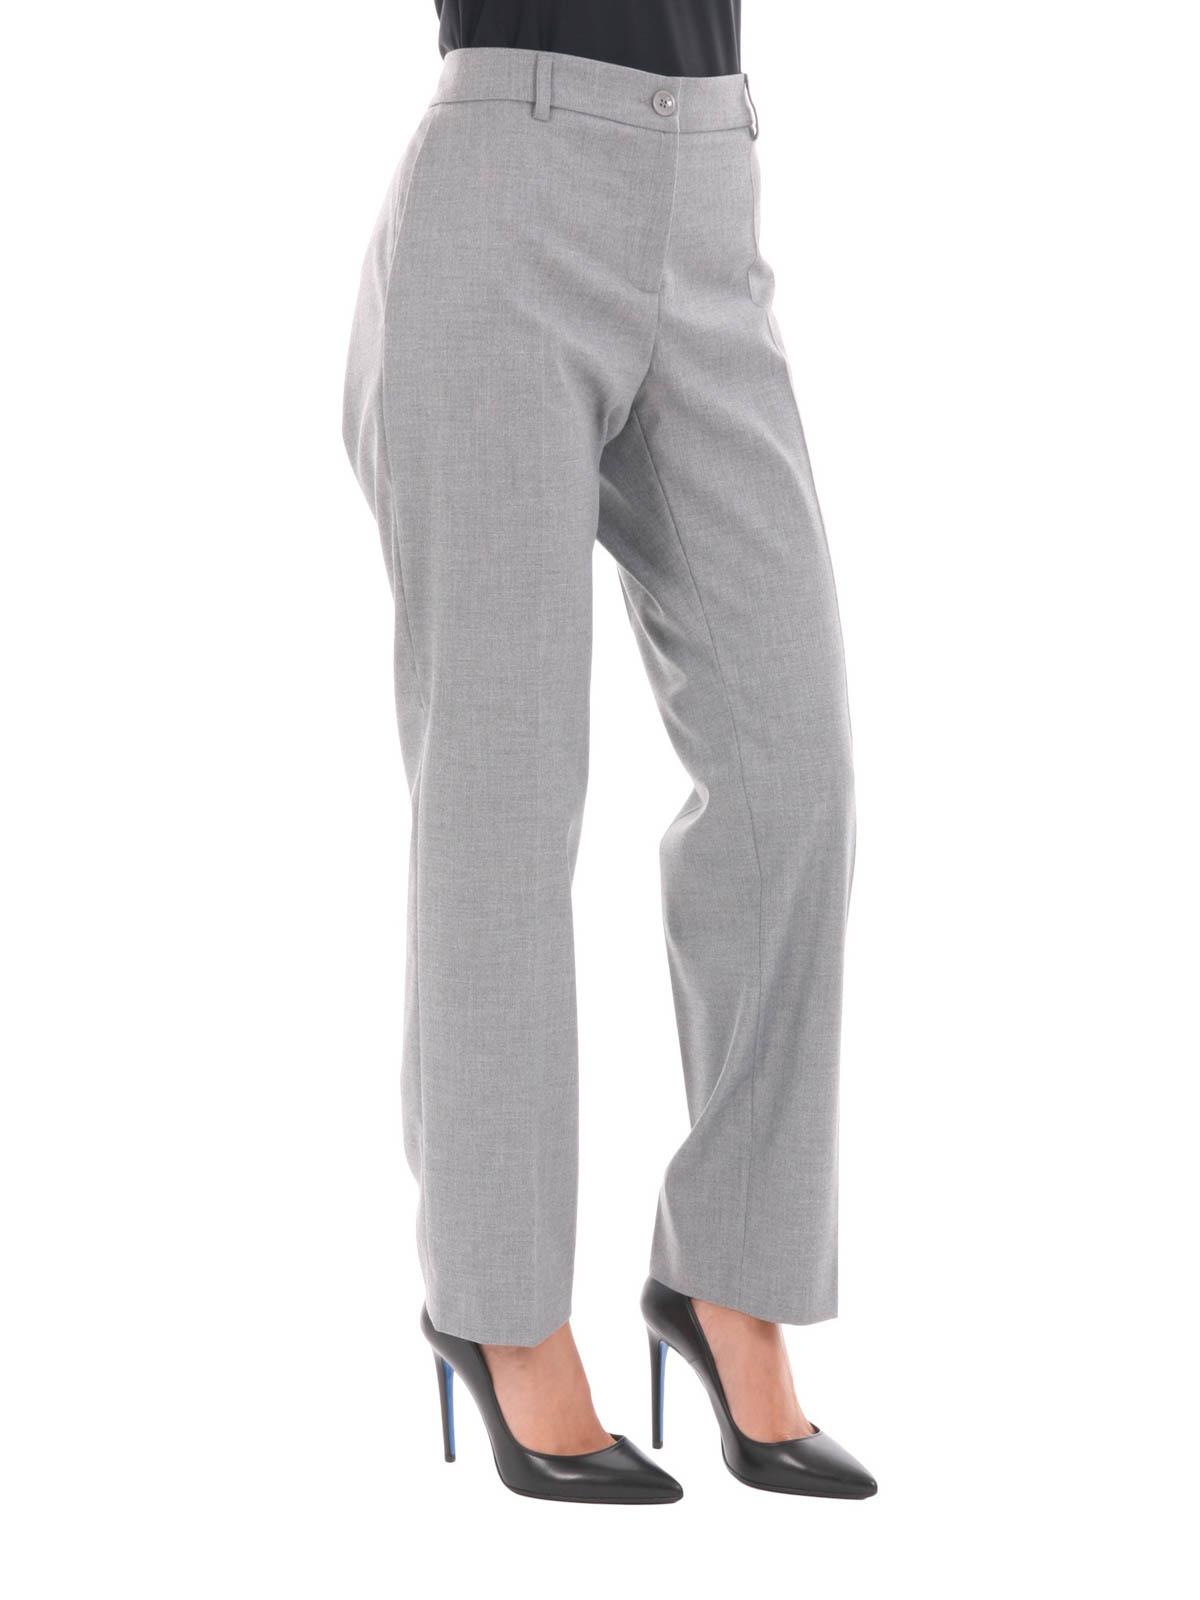 Blugirl Pantalón De Vestir Gris Para Mujer Pantalones De